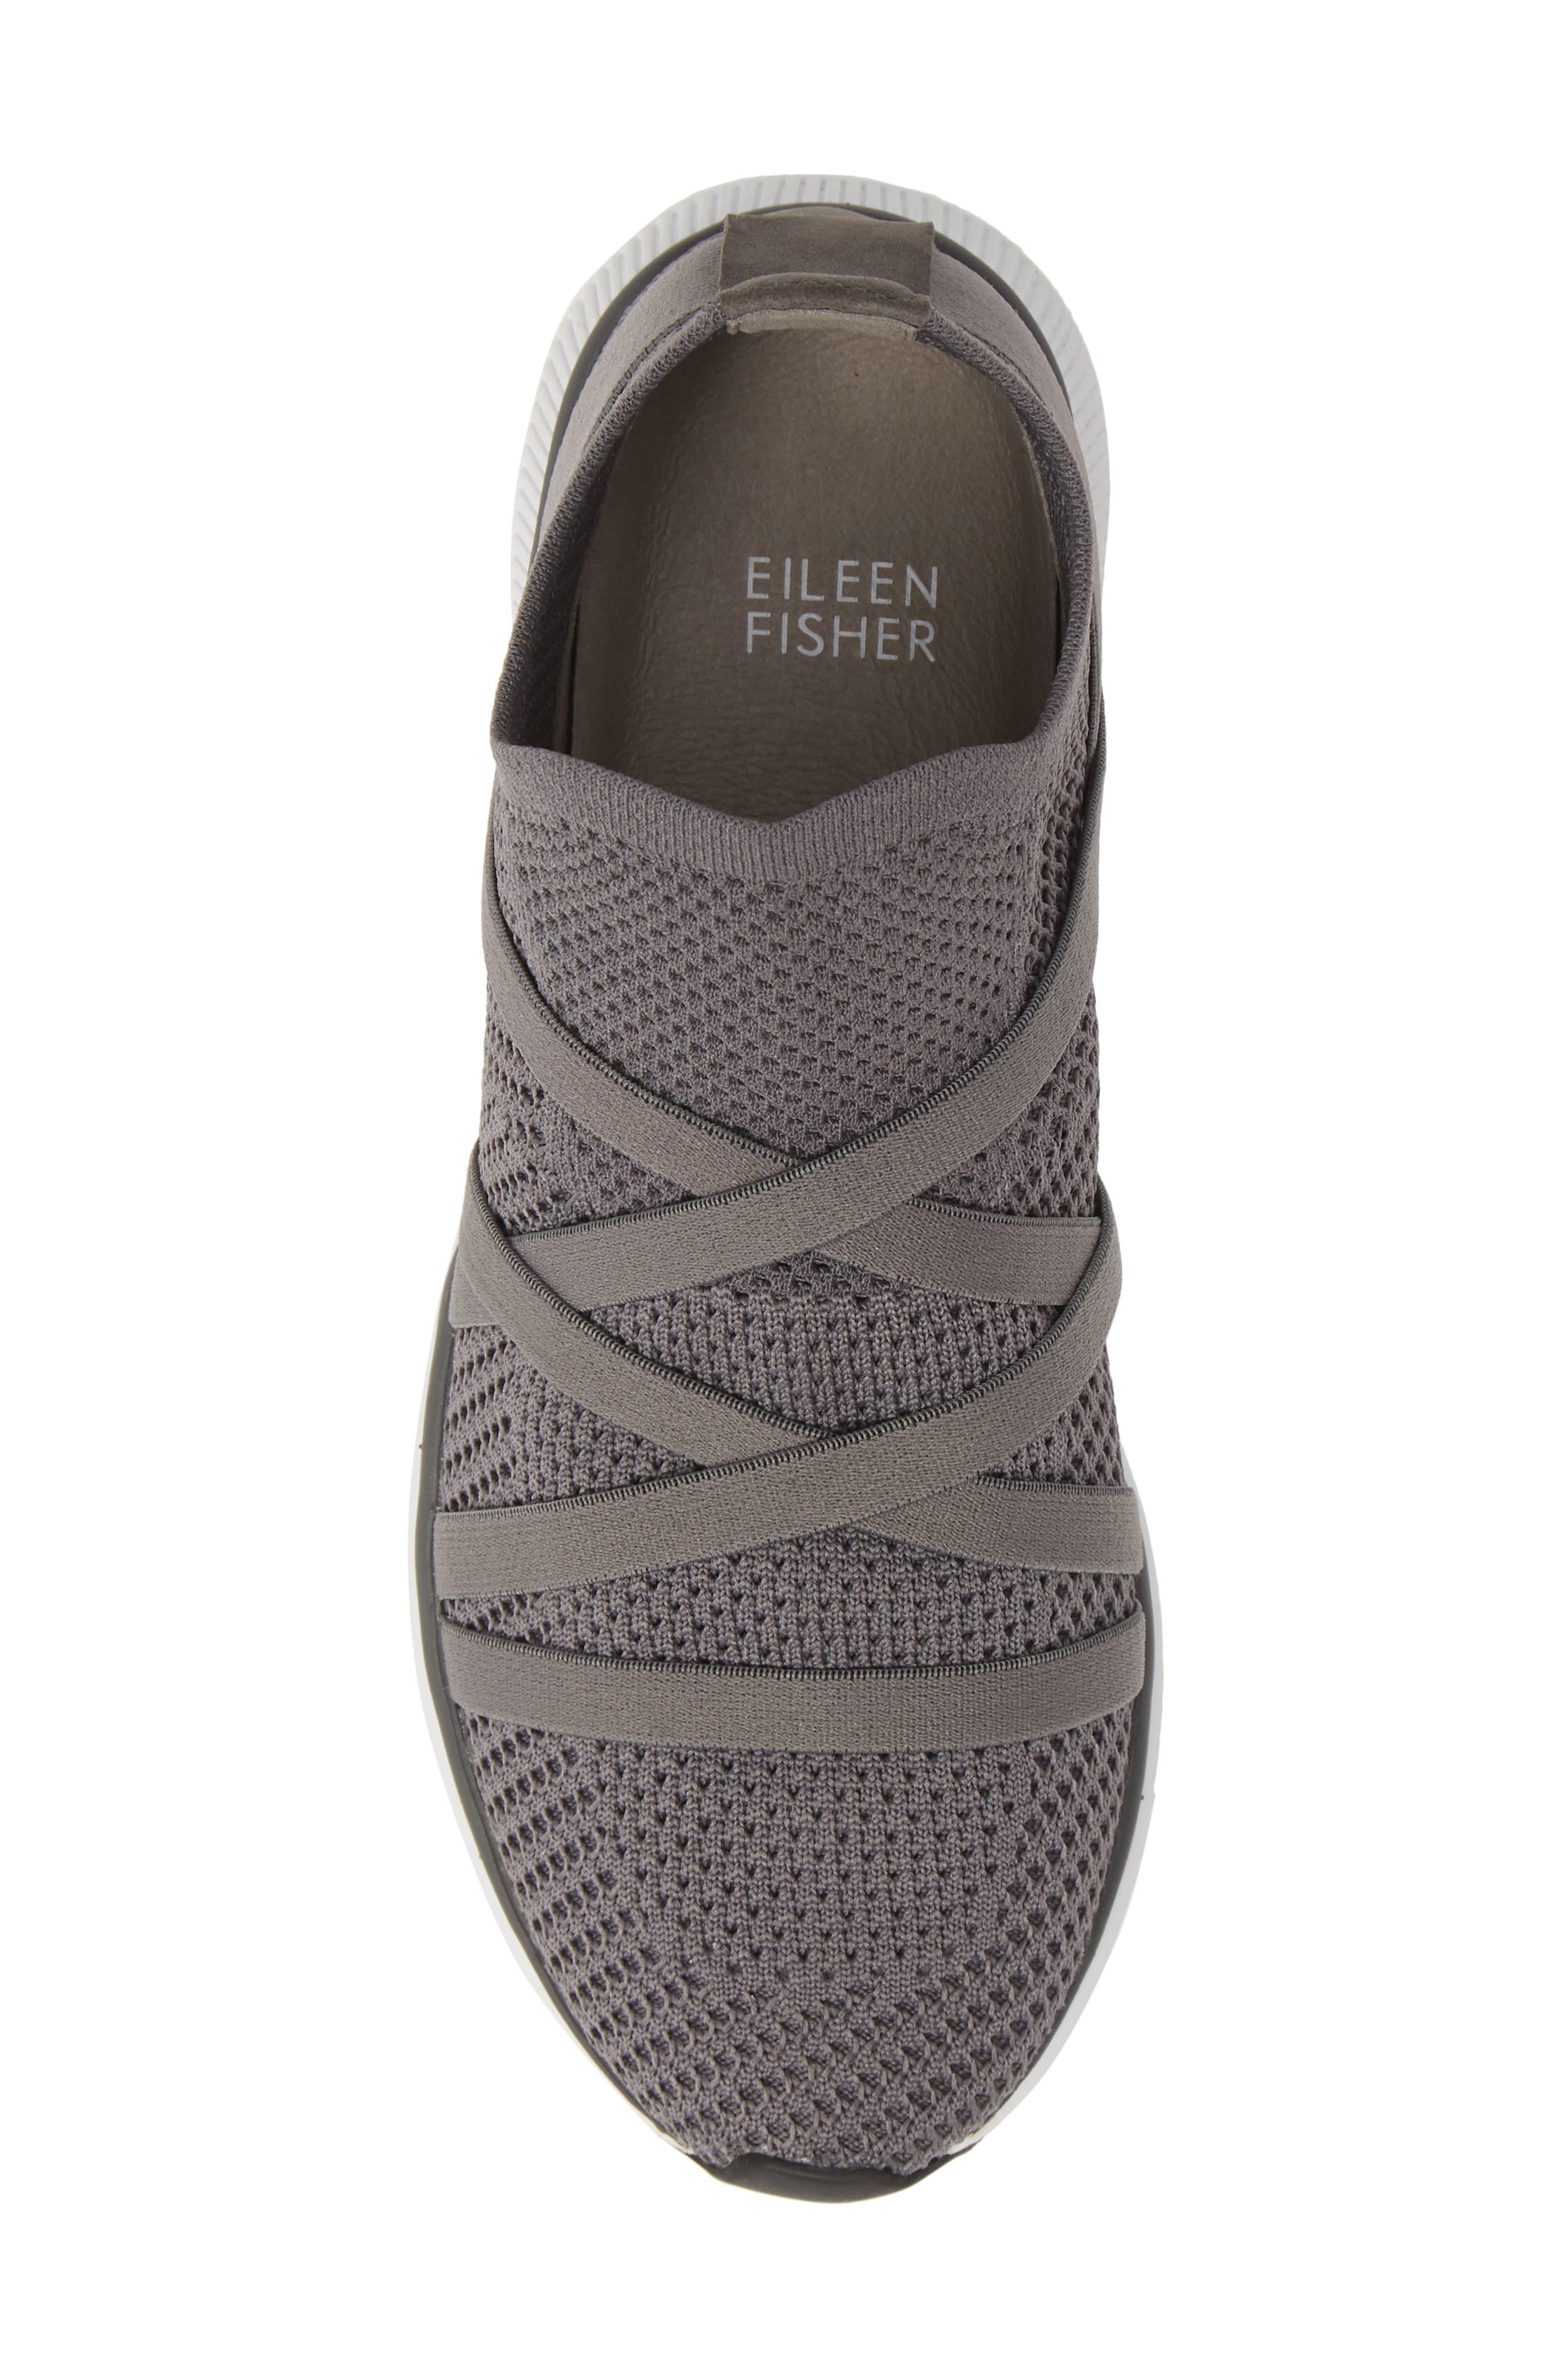 EILEEN FISHER,                             Xanady Woven Slip-On Sneaker,                             Alternate thumbnail 5, color,                             GRAPHITE FABRIC